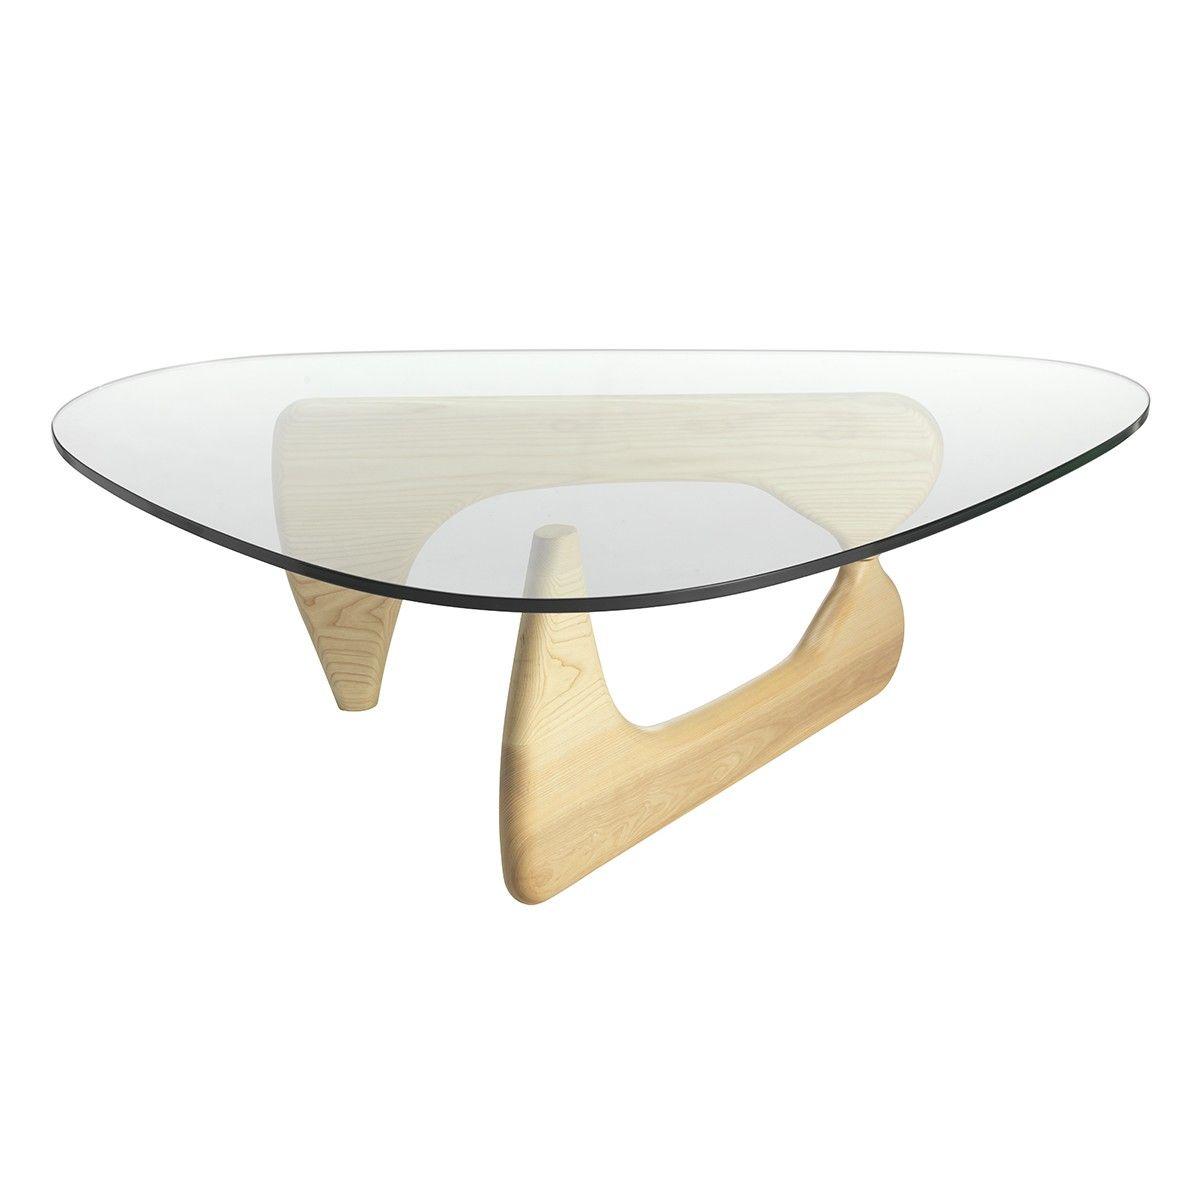 Replica isamu noguchi coffee table ash coffee tables nick replica isamu noguchi coffee table ash coffee tables nick scali online nick scali geotapseo Gallery